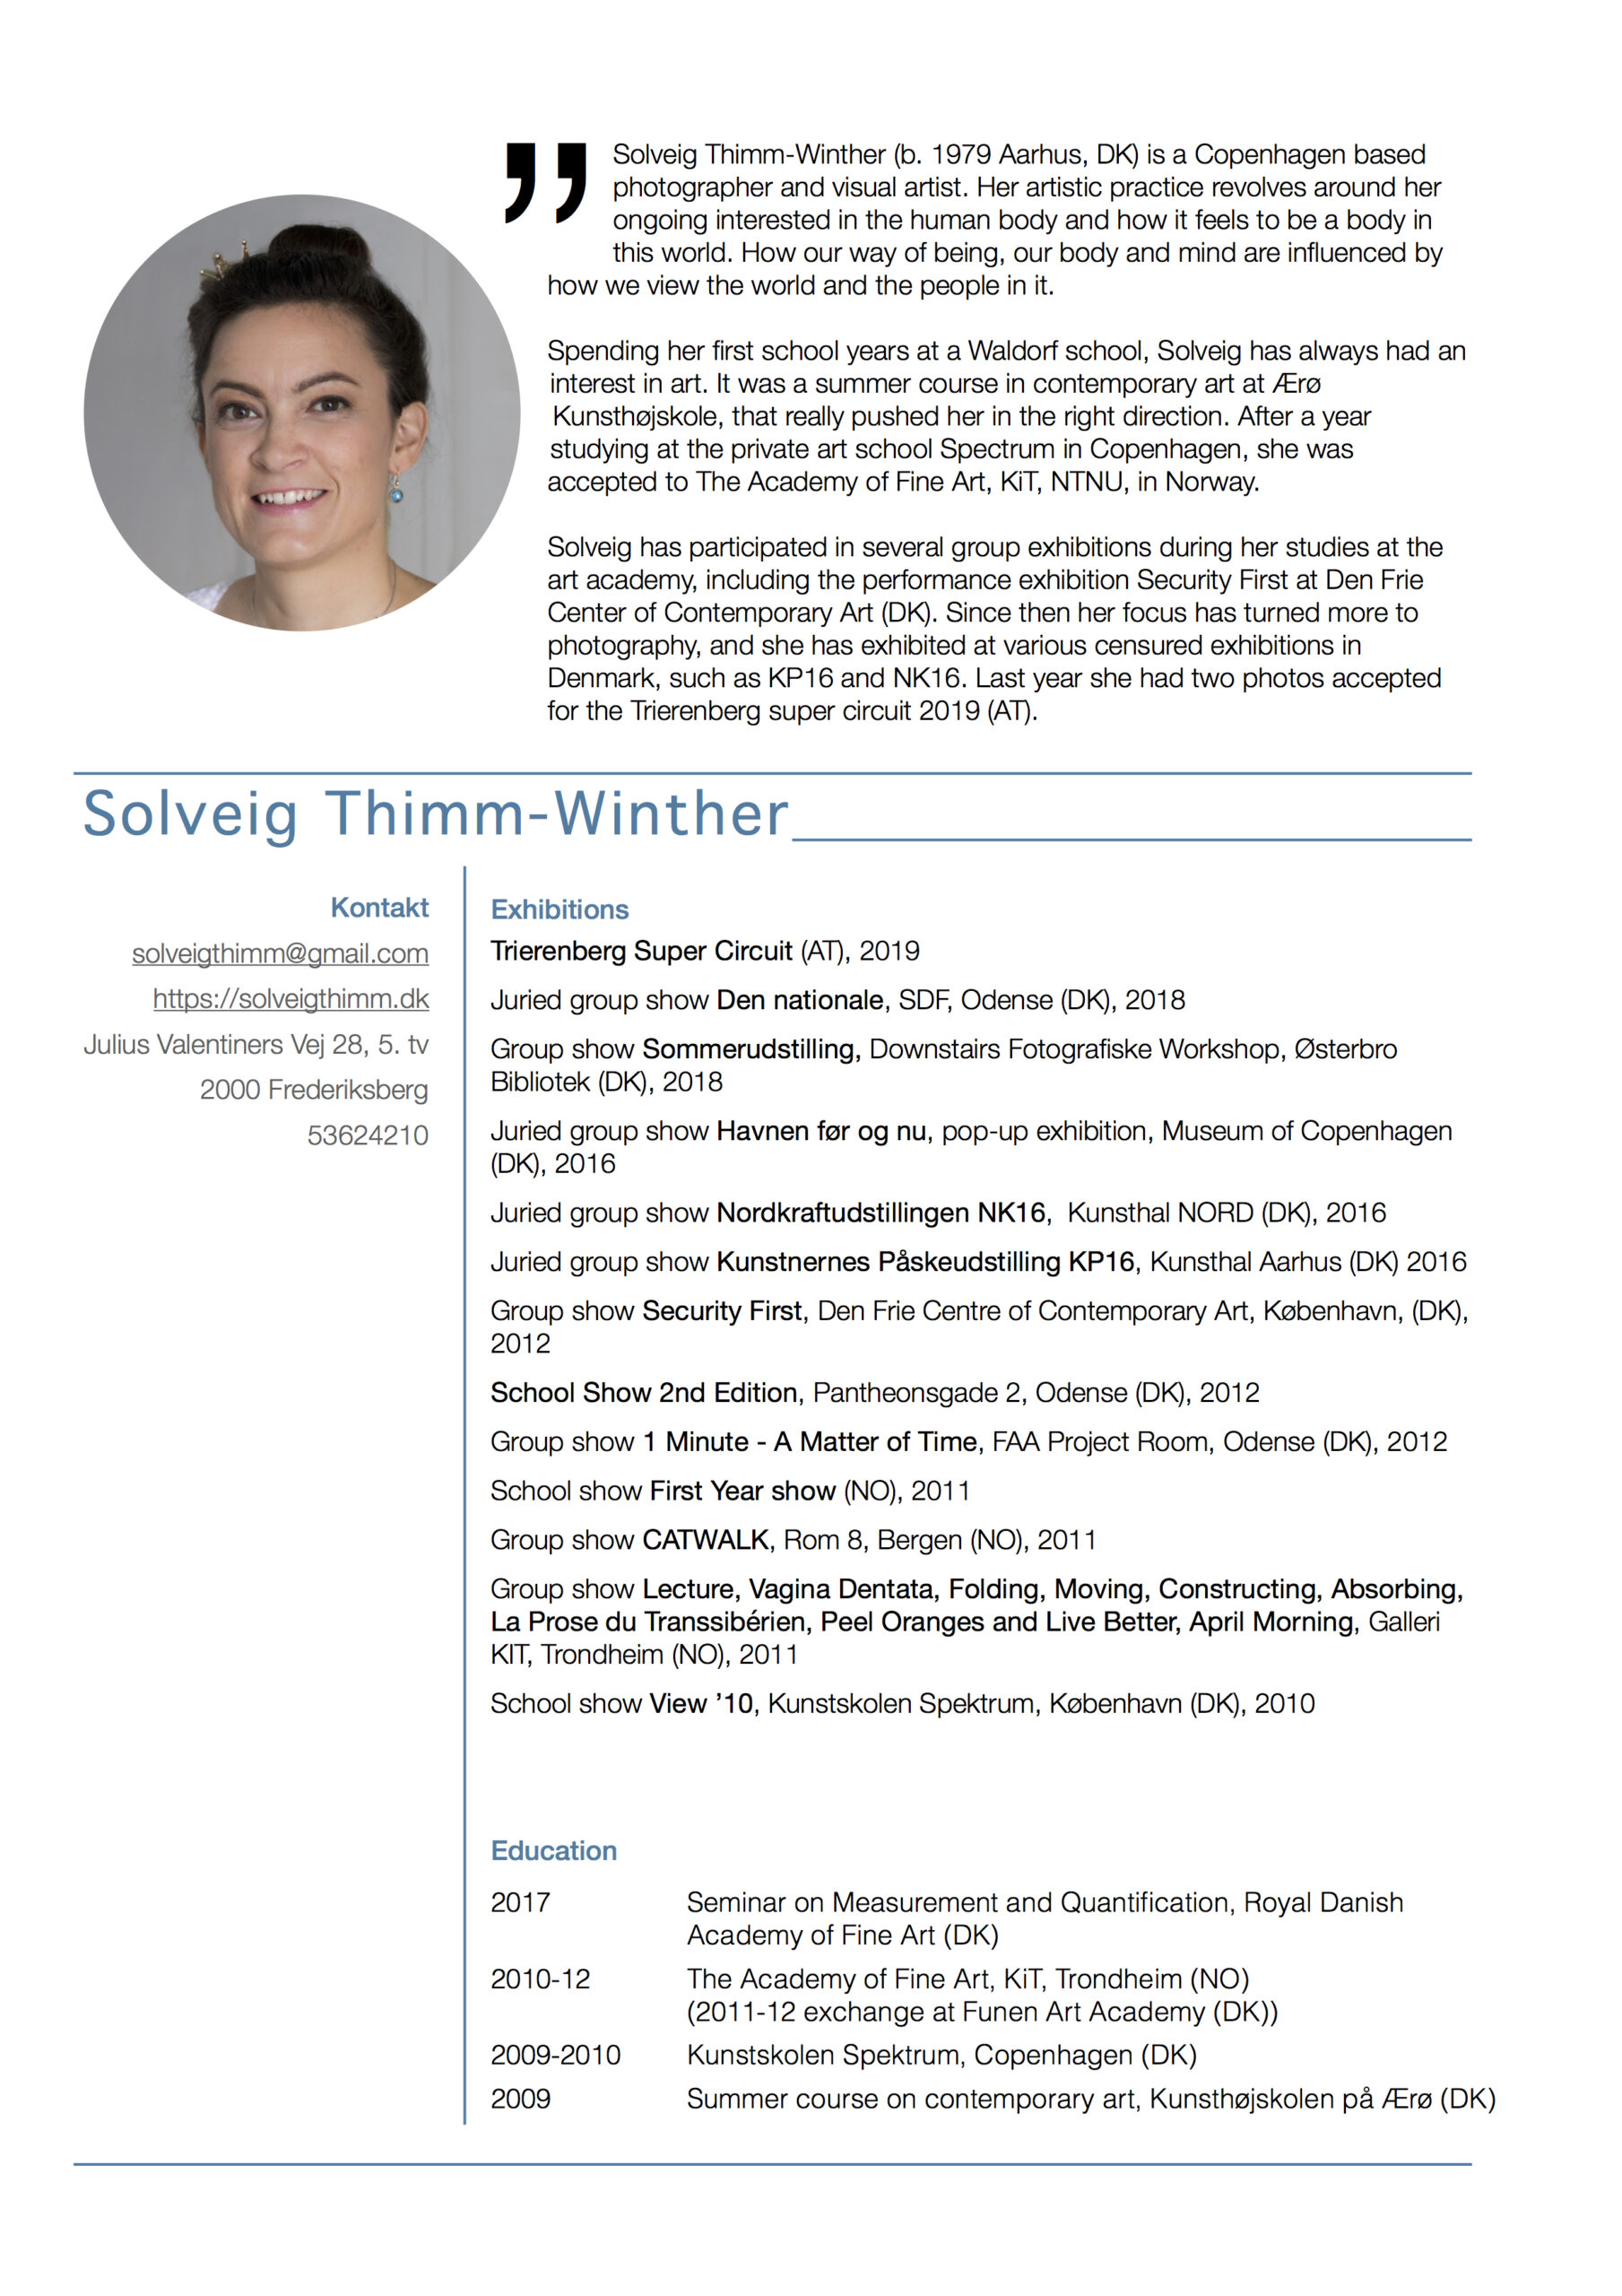 Artist CV, Solveig Thimm-Winther